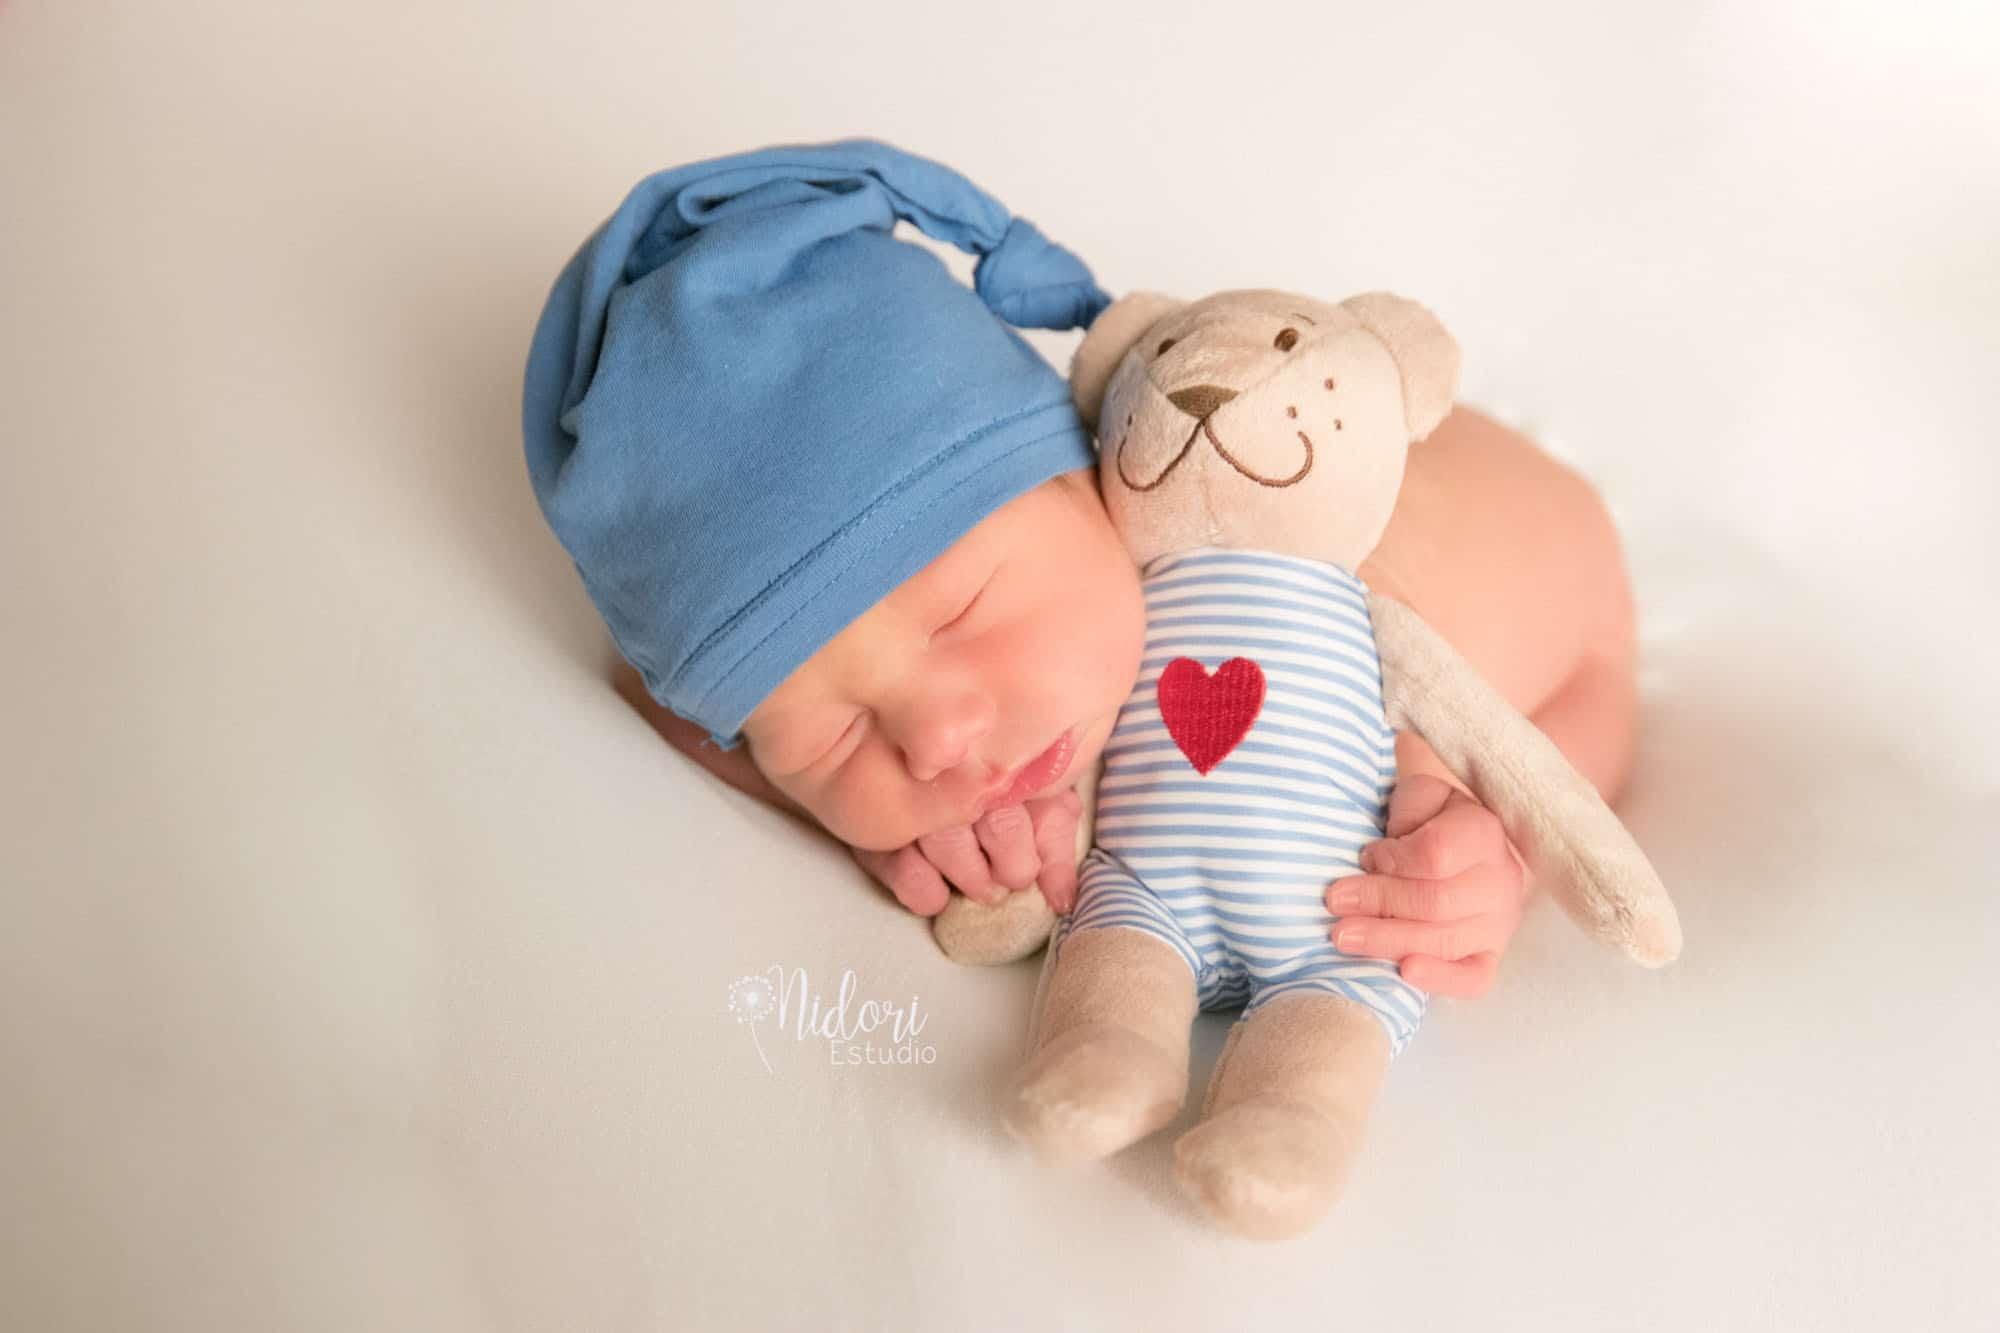 fotosbebe-fotografia-recien-nacido-newborn-bebes-nidoriestudio-fotos-valencia-almazora-castellon-españa-spain-09